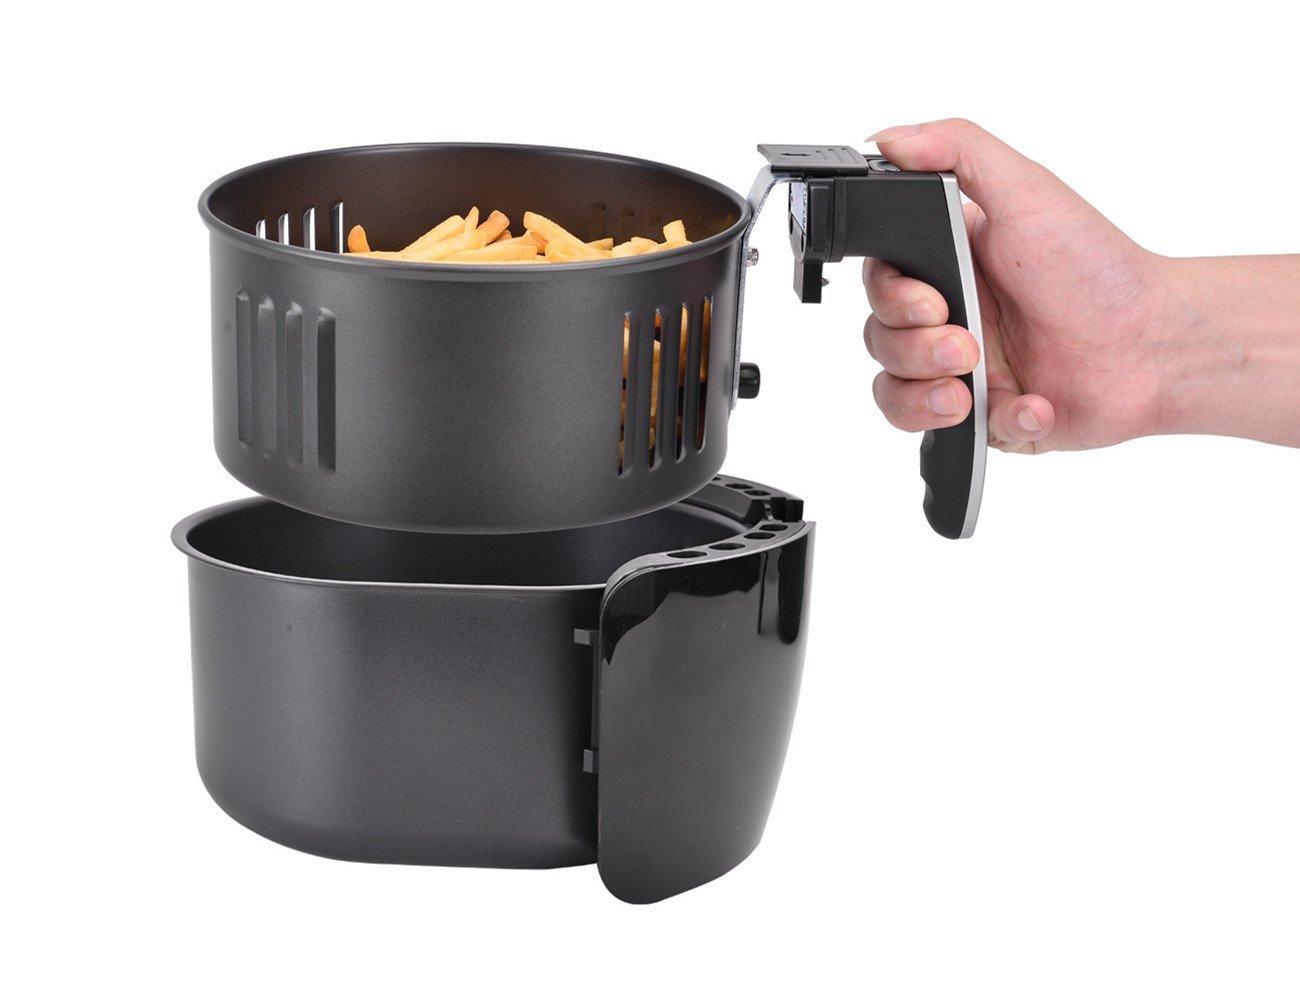 Amazon.com: Kintech Depp Air Fryer 3.2 QT, Electric Hot Air Fryer with Time & Temperature Control: Kitchen & Dining